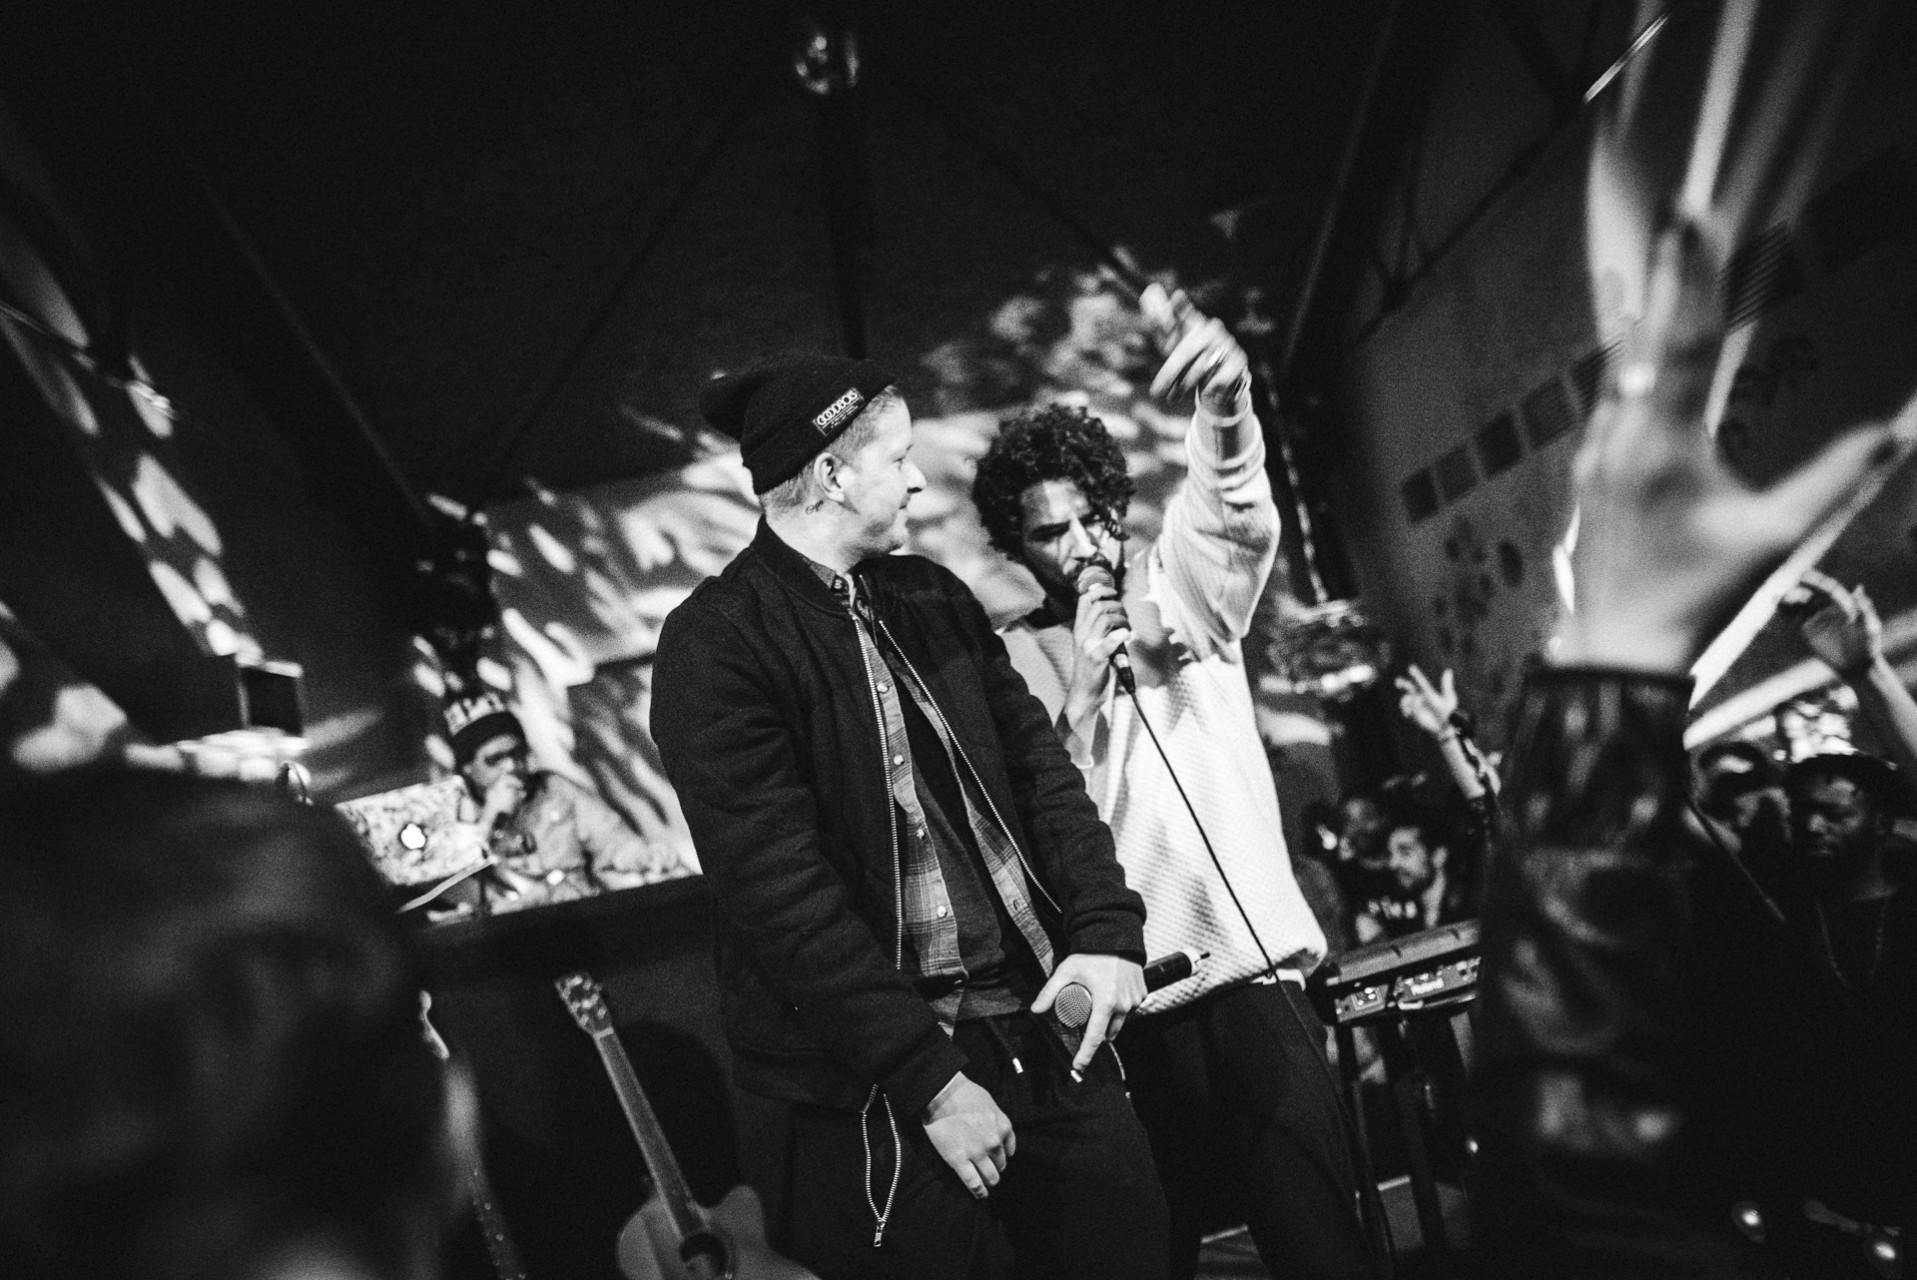 Matteo Capreoli & Nico Suave